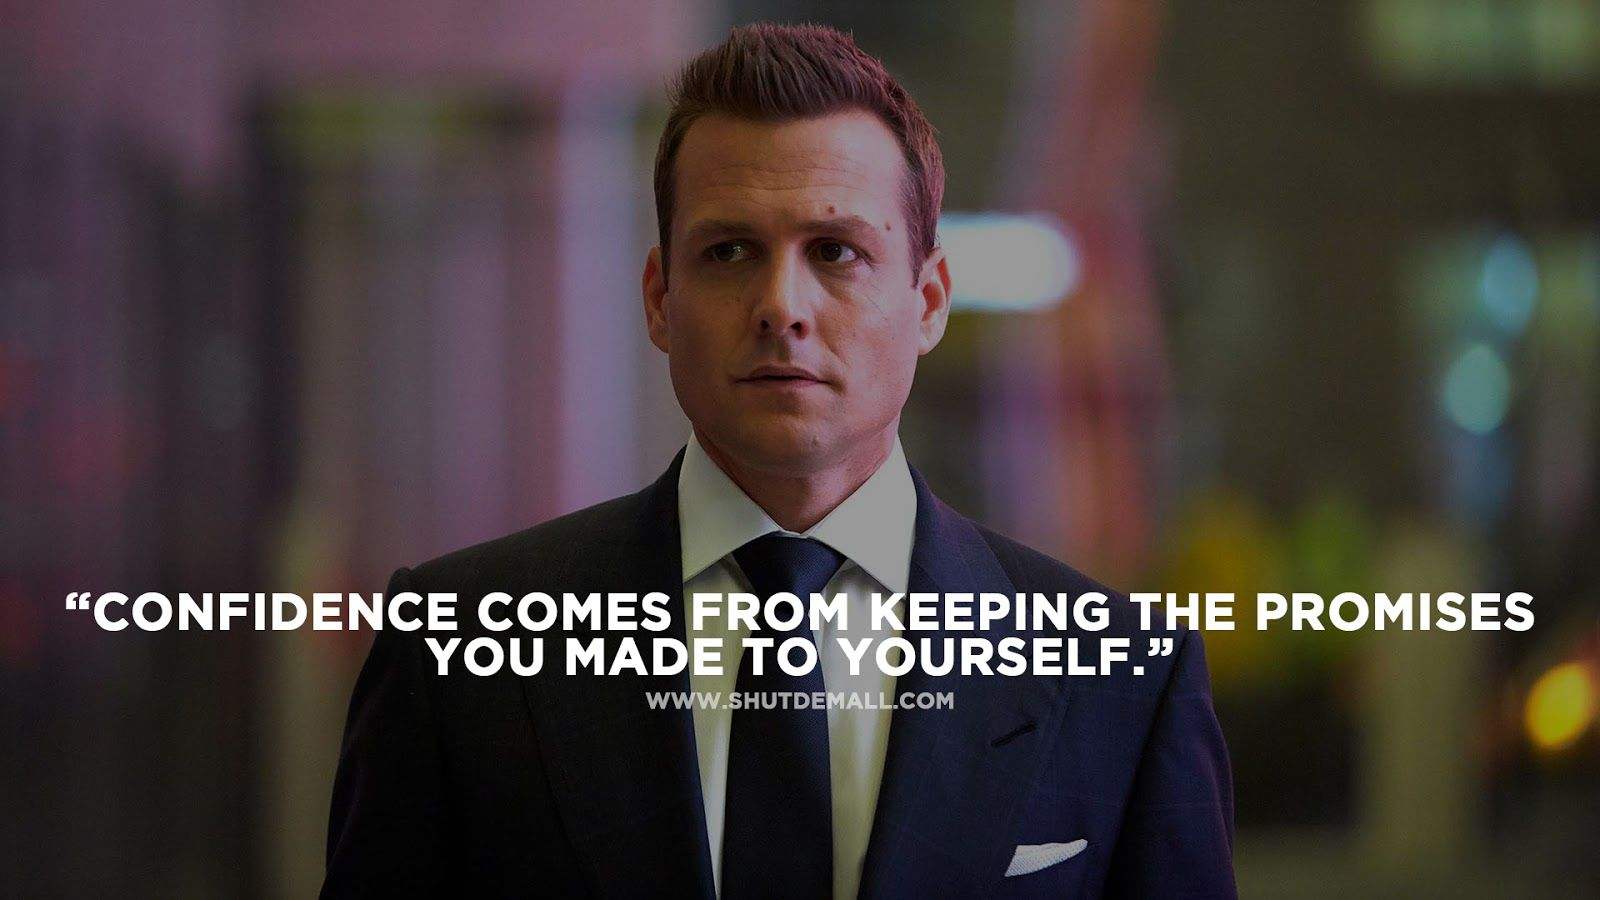 Harvey specter quotes Harvey Specter